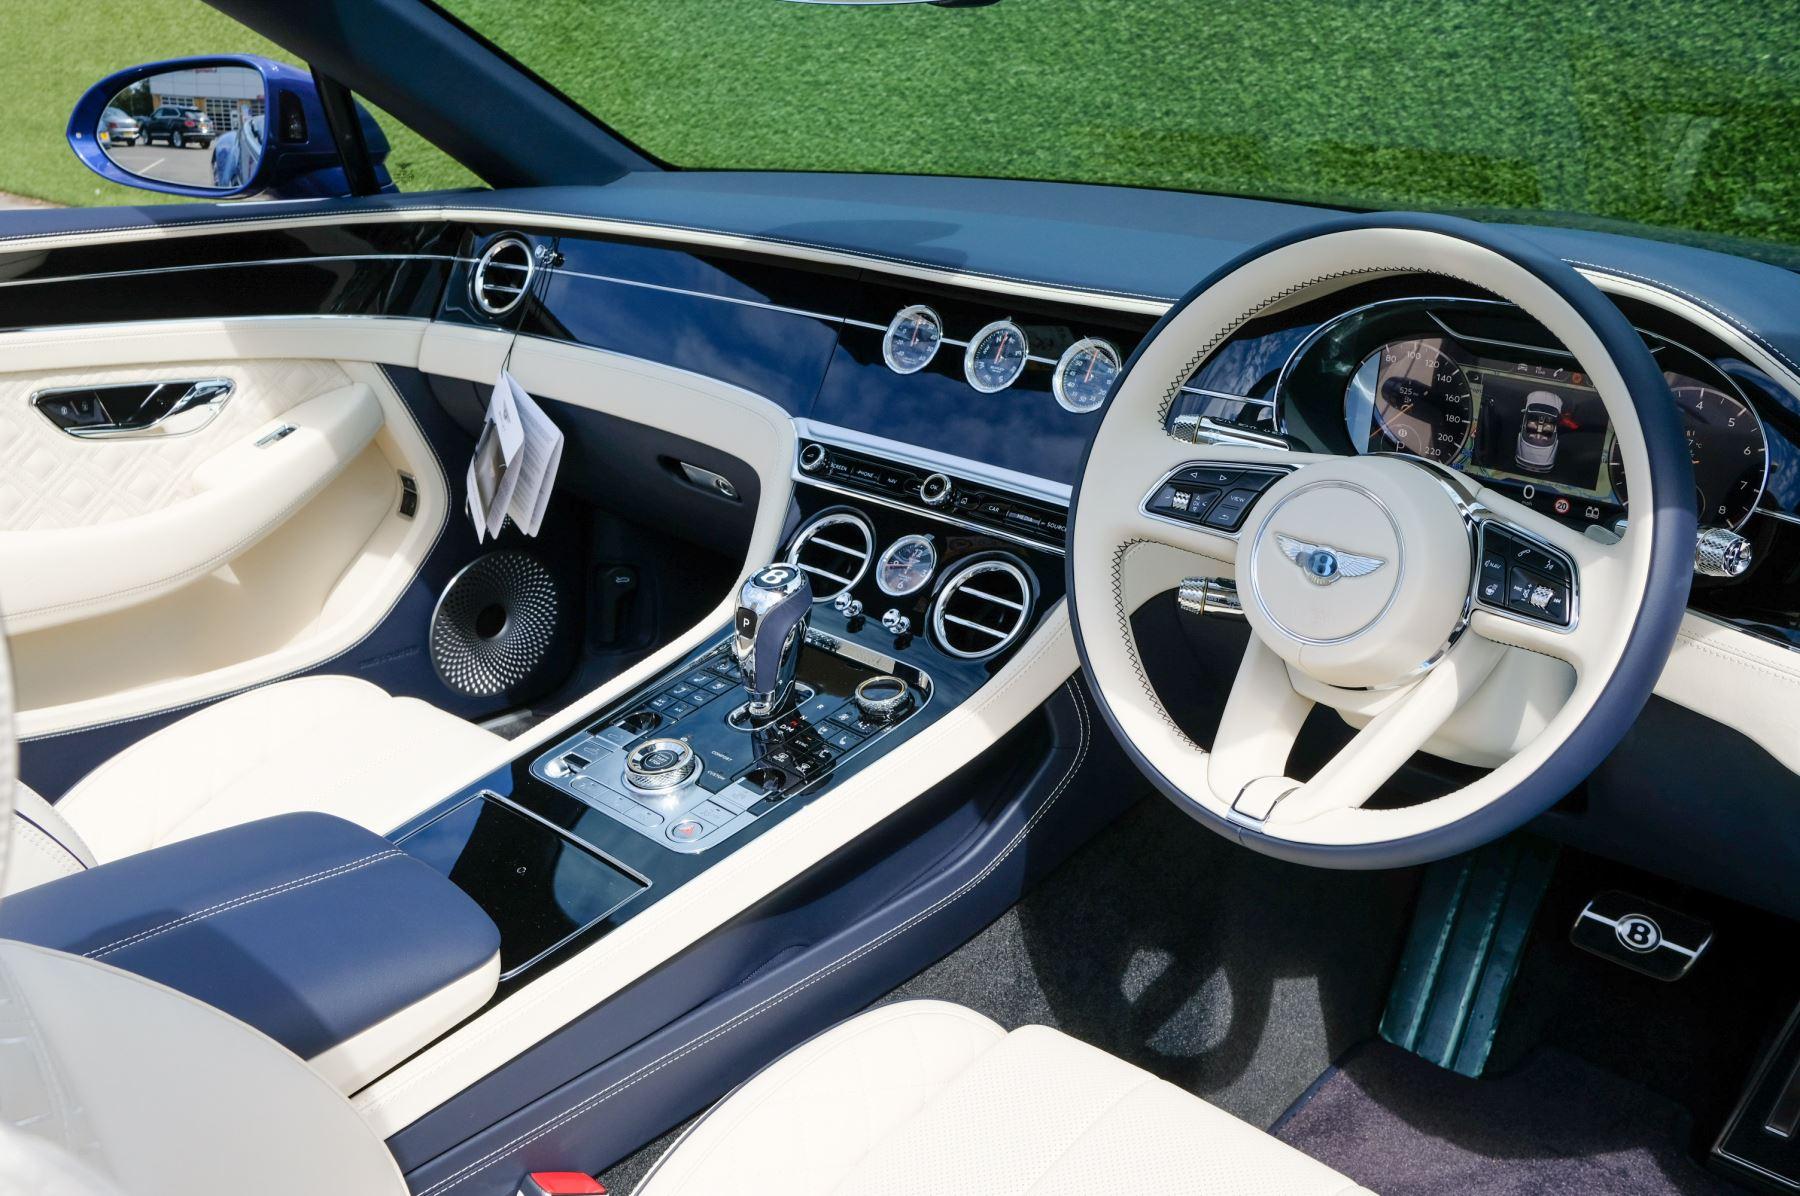 Bentley Continental GTC 4.0 V8 Mulliner Edition 2dr Auto [Tour Spec] image 12